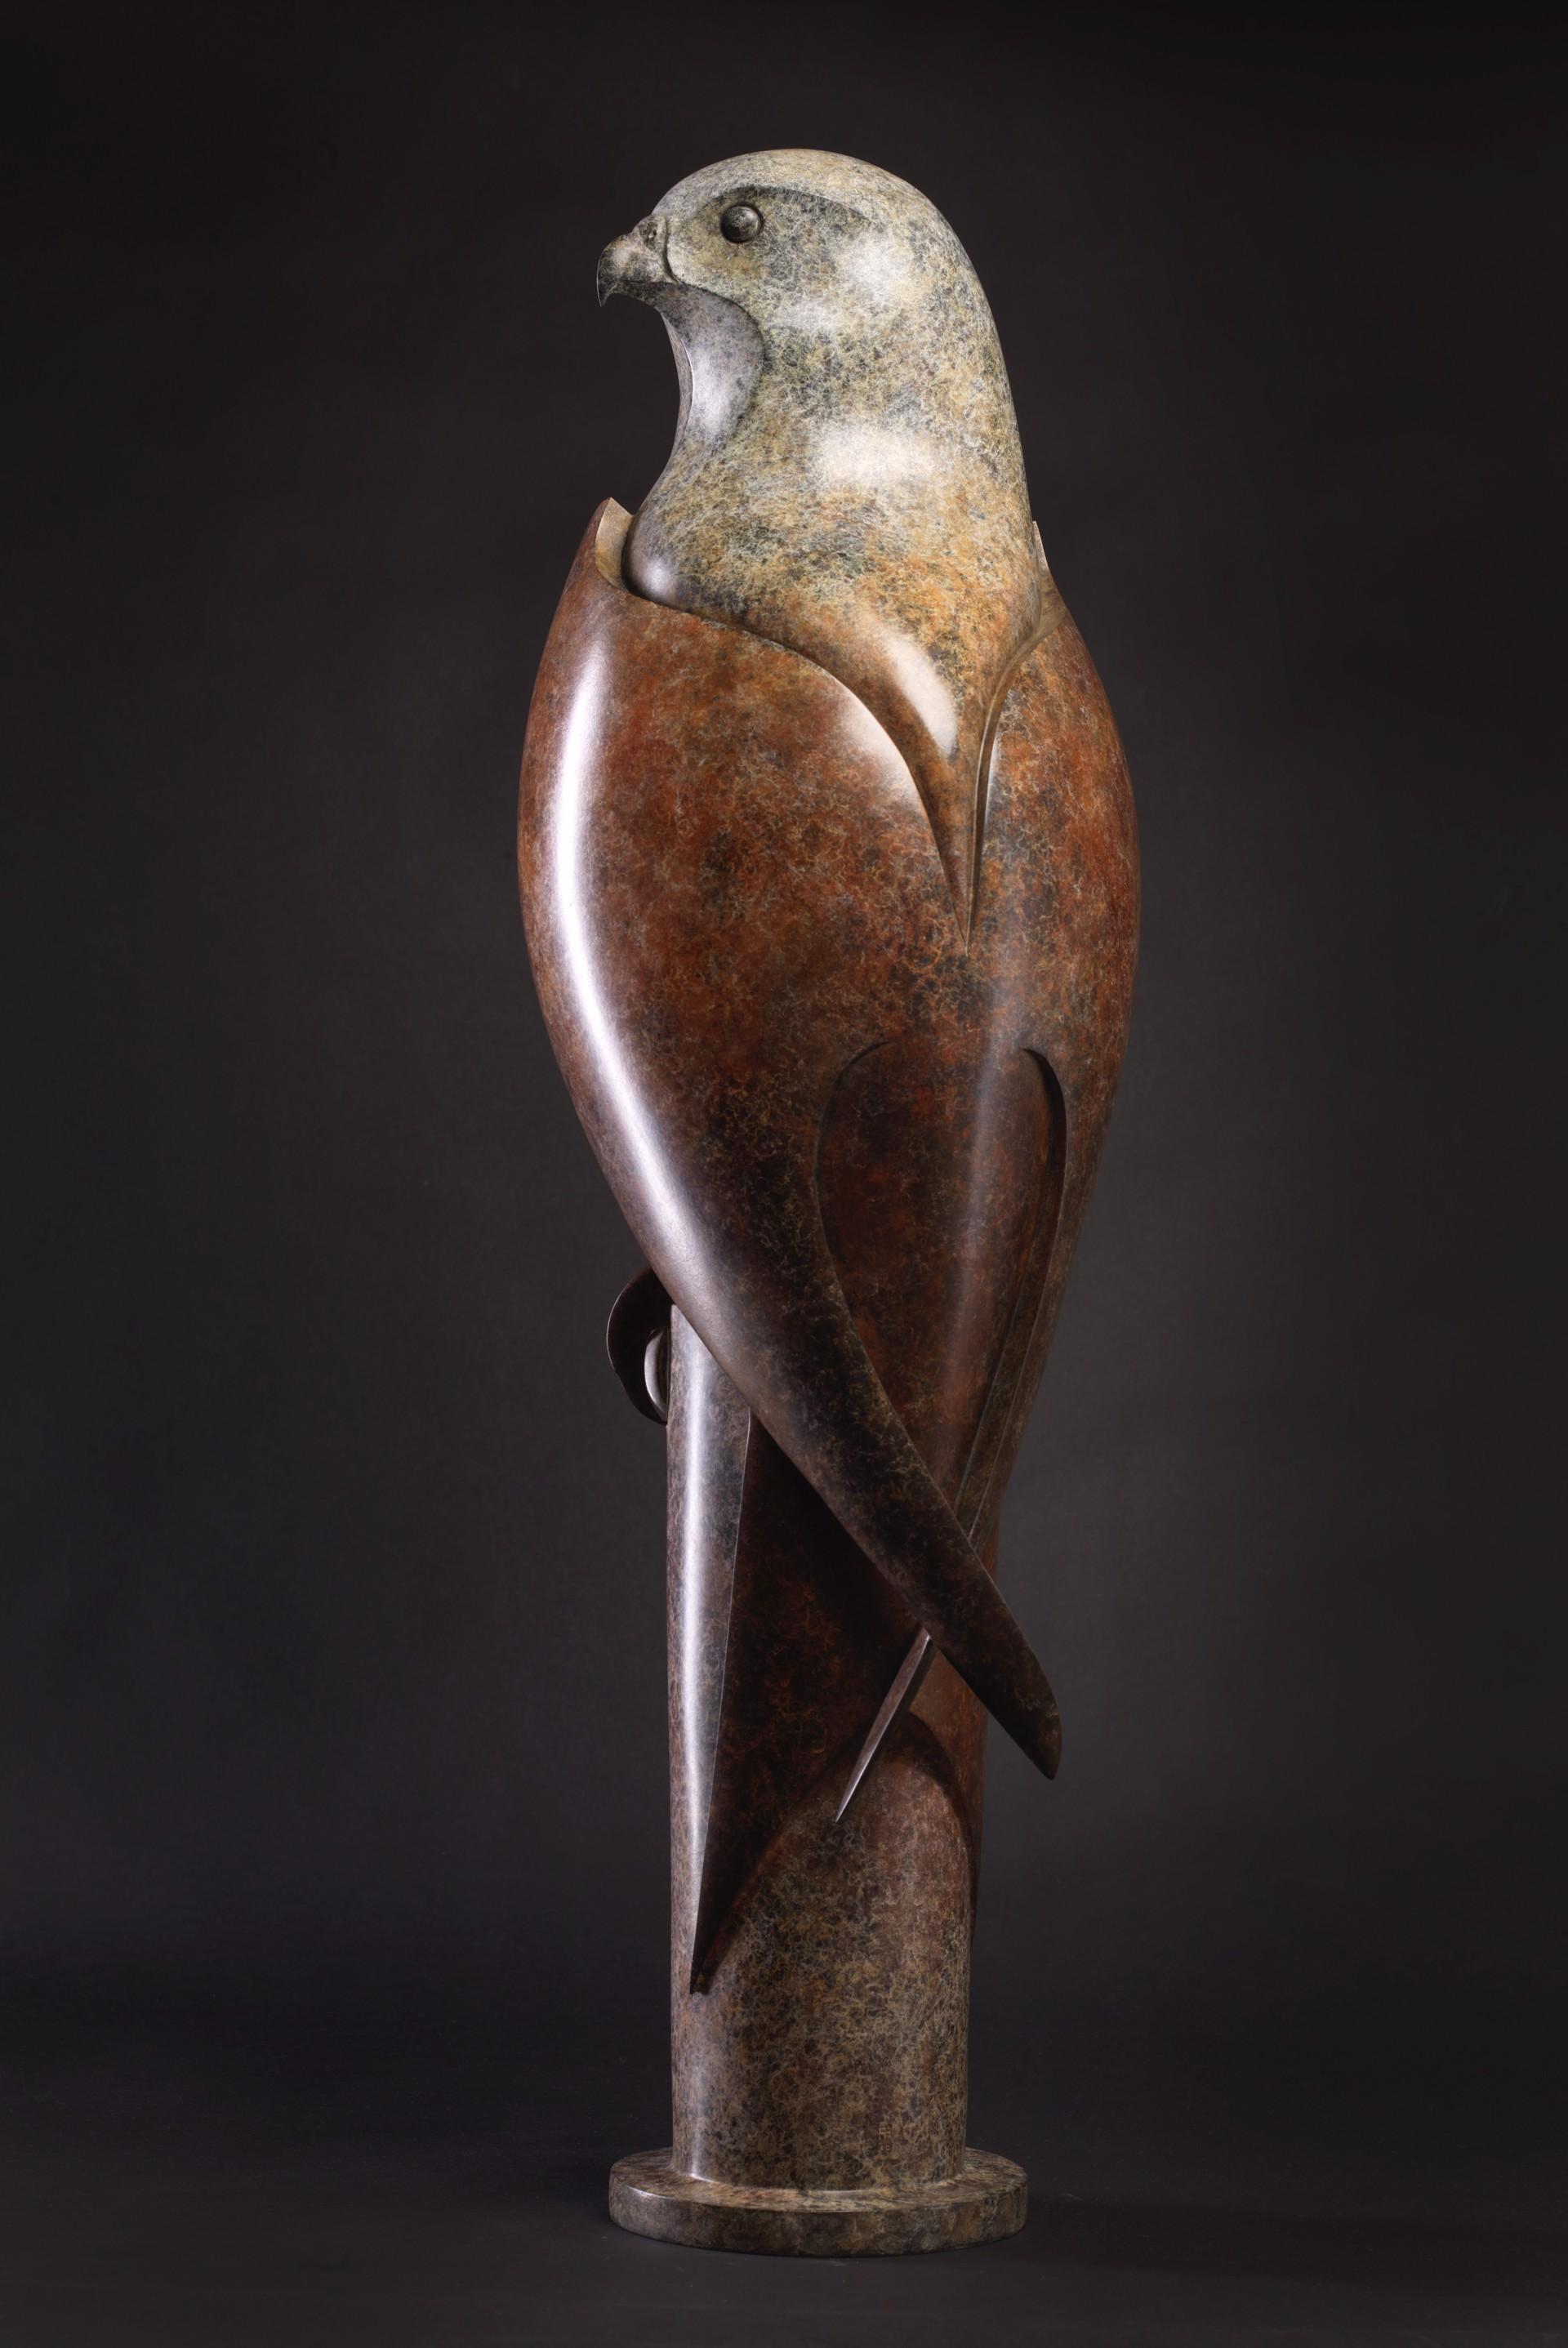 Red Kite by Paul Harvey